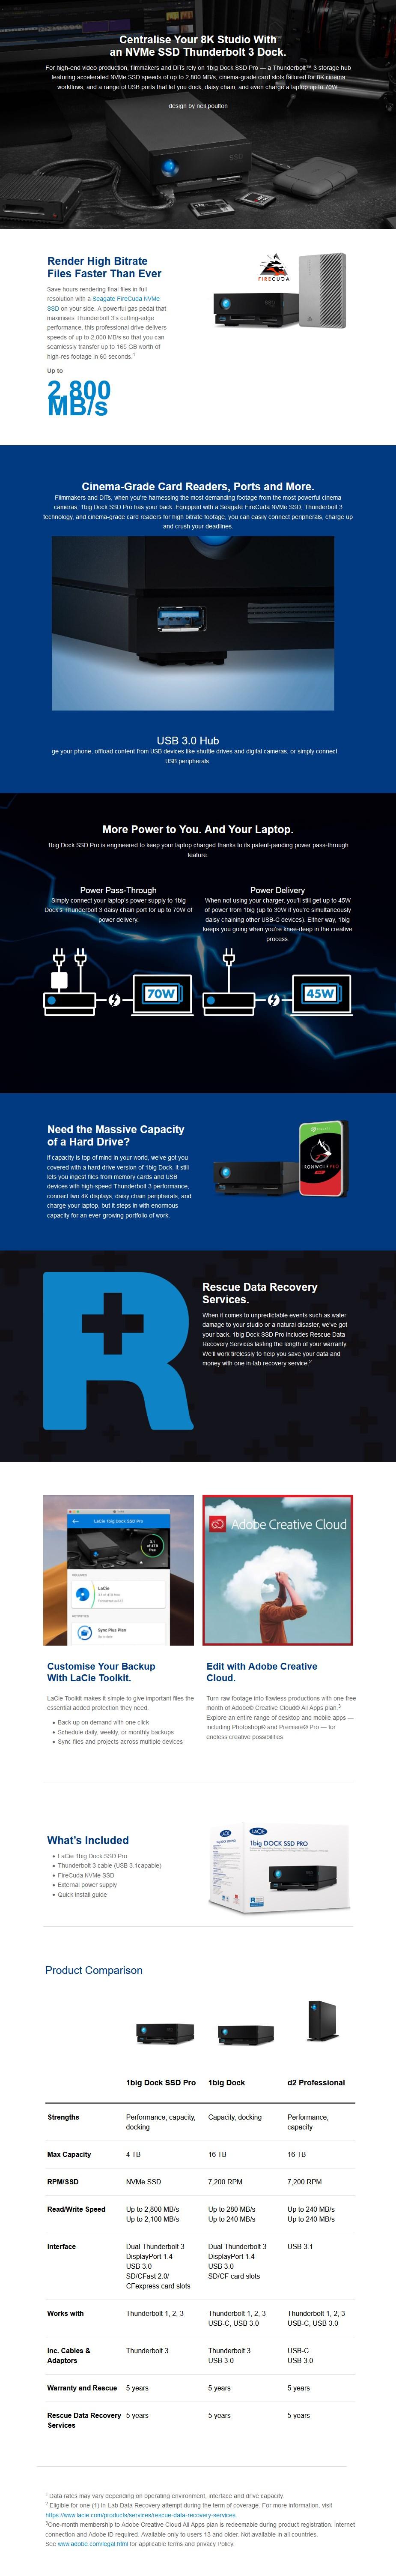 LaCie 1big Dock SSD Pro 4TB Thunderbolt 3 External SSD Drive - Overview 1